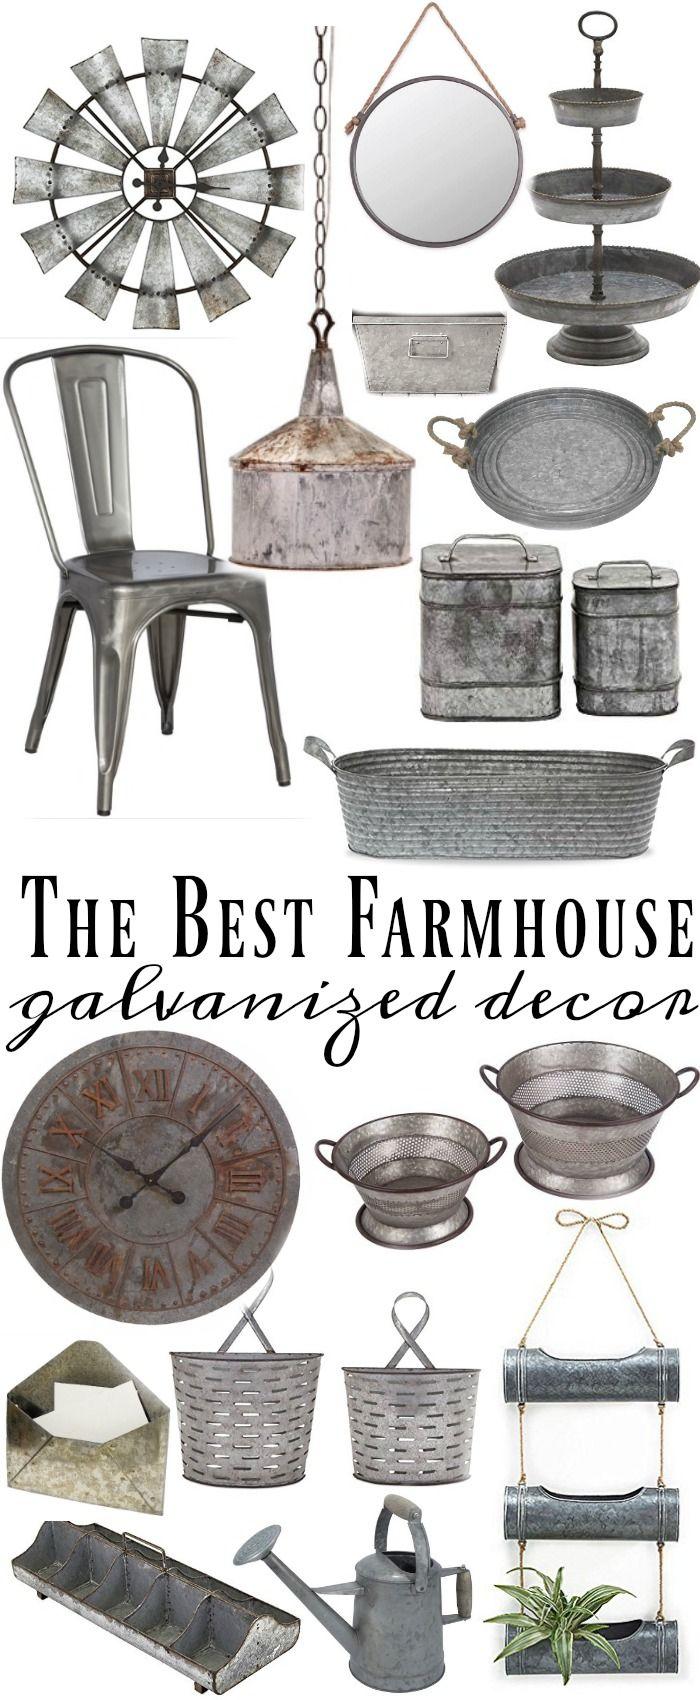 Where To Find The Best Galvanized Home Decor Galvanized Decor